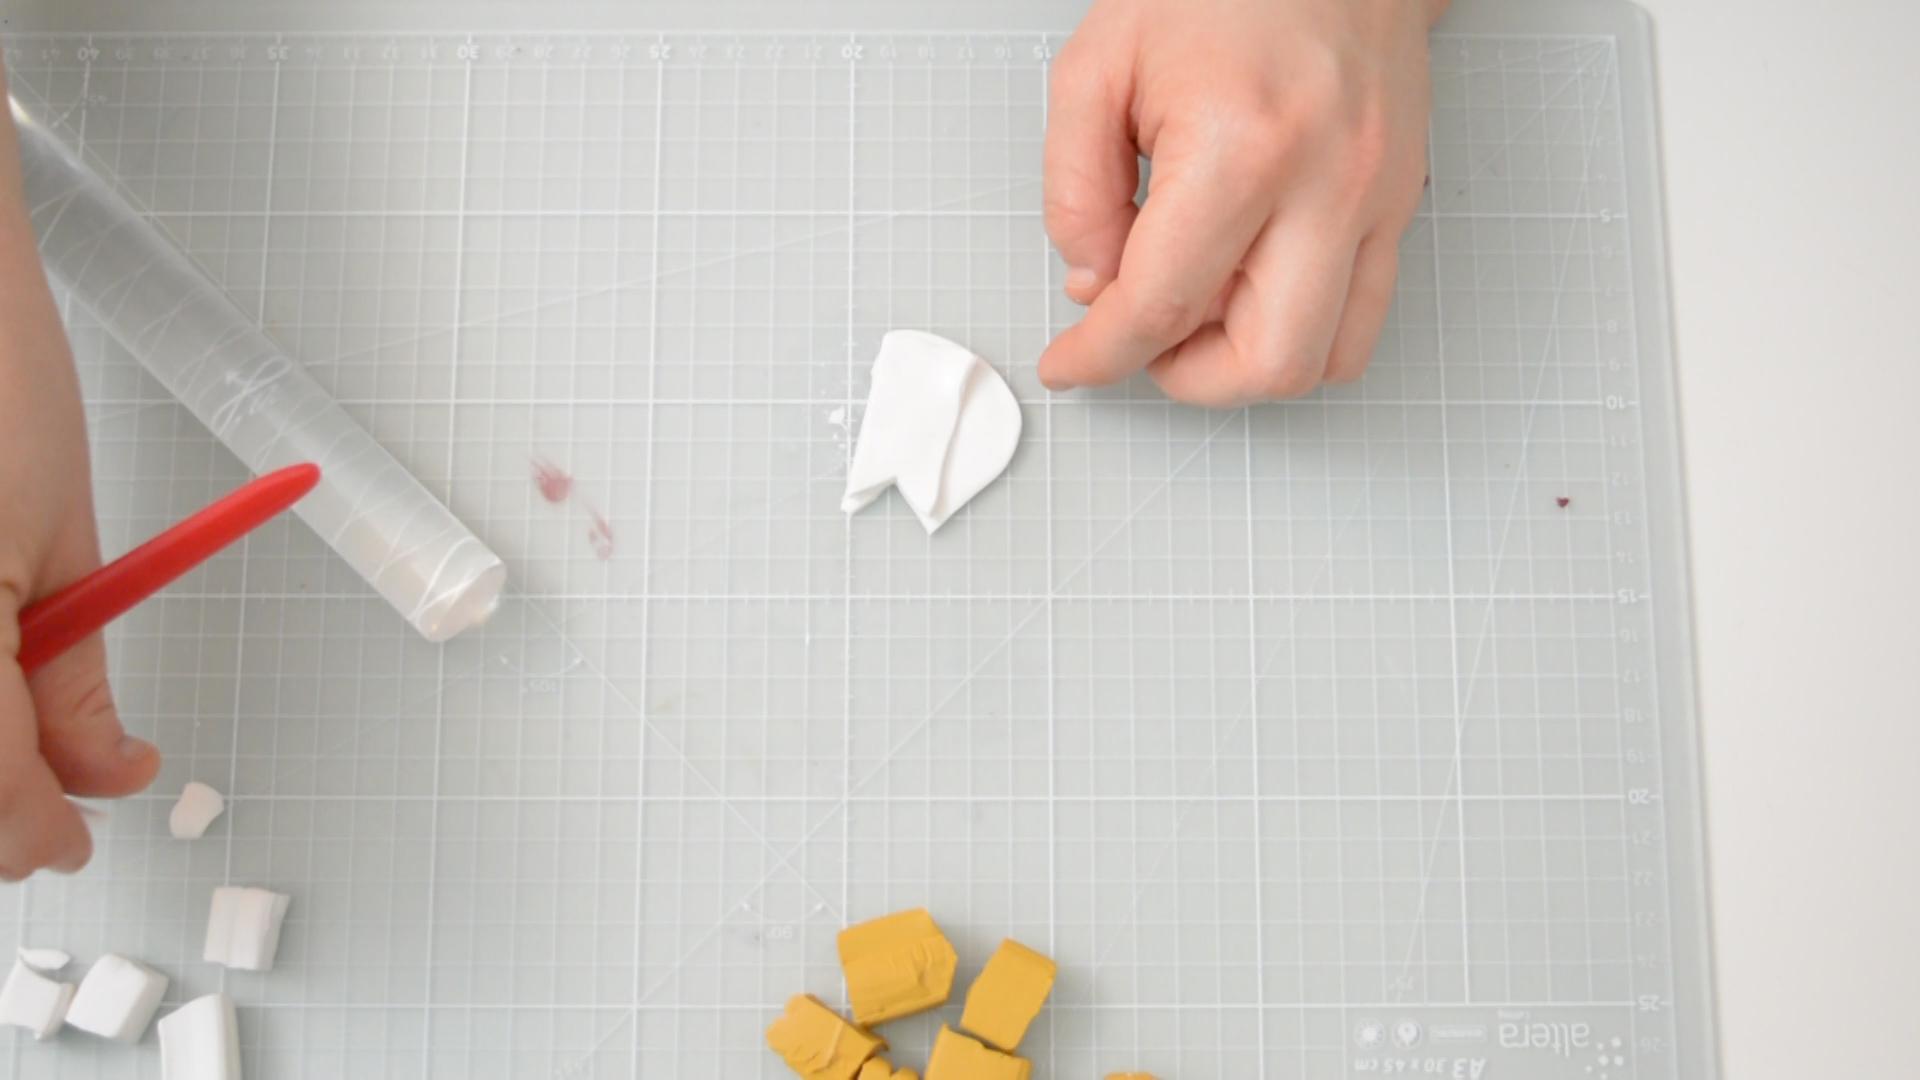 Glückskekse Selber Machen diy glückskekse aus fimo basteln mit mohntage